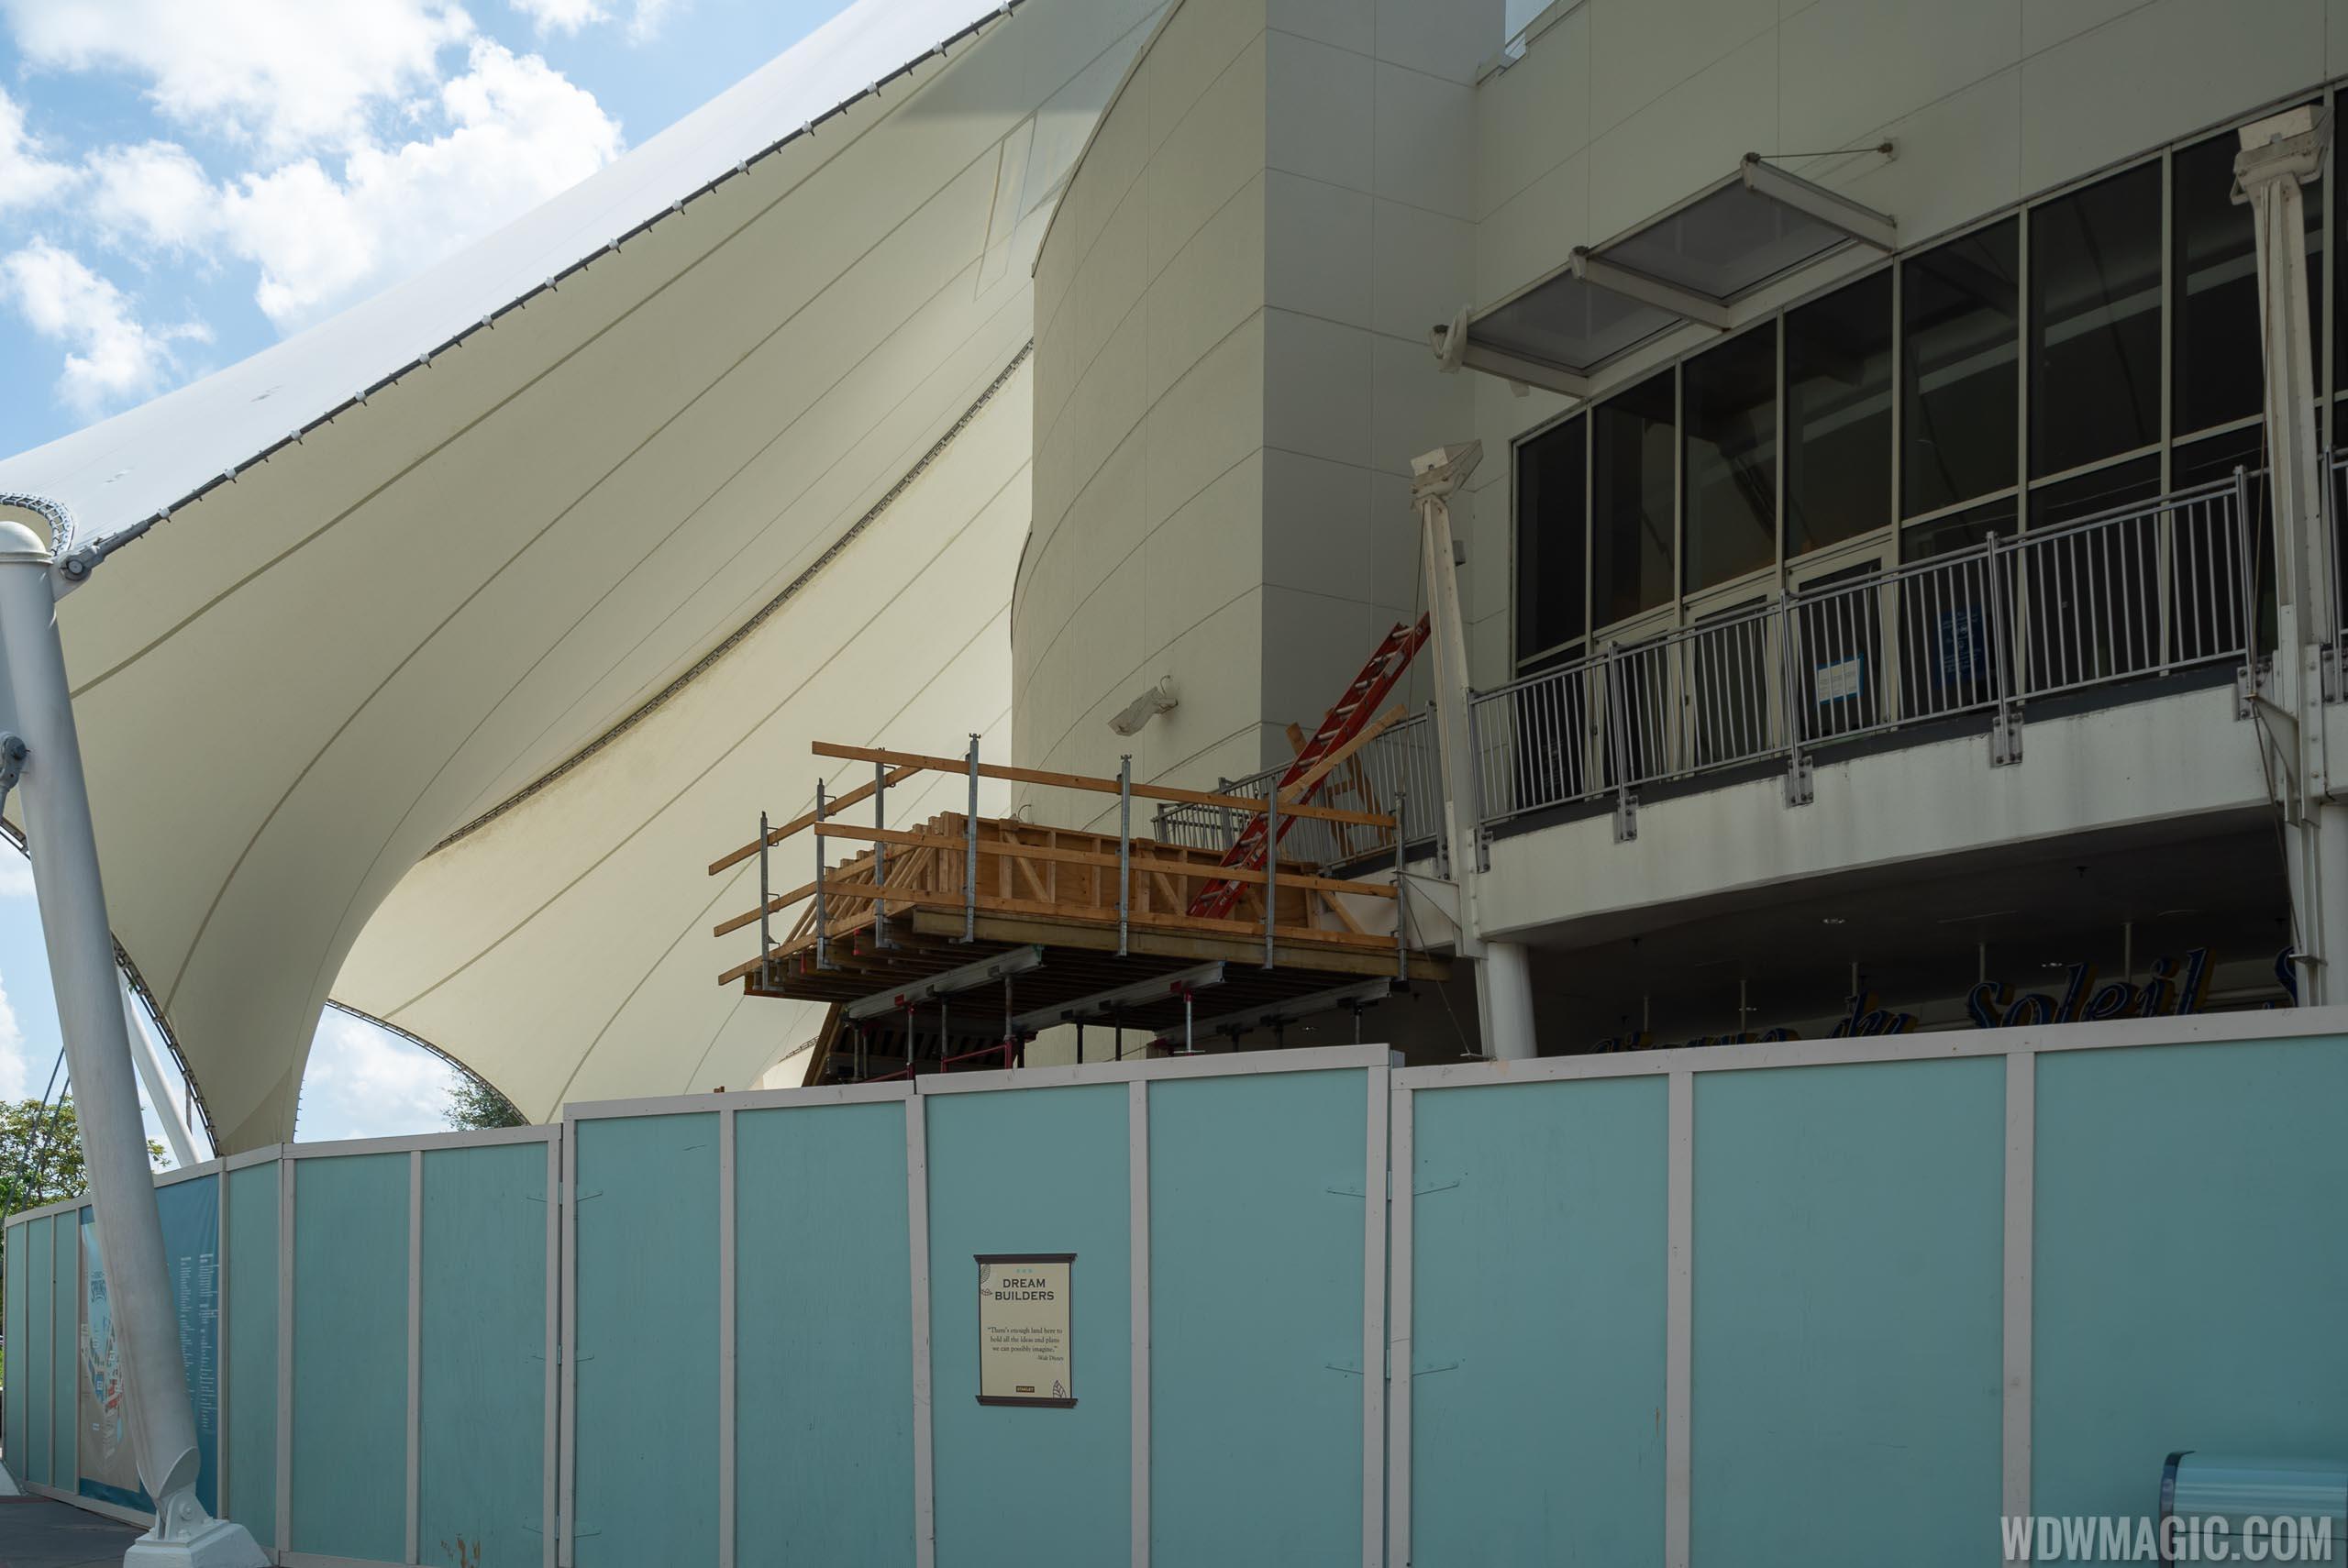 Cirque du Soleil exterior stair construction